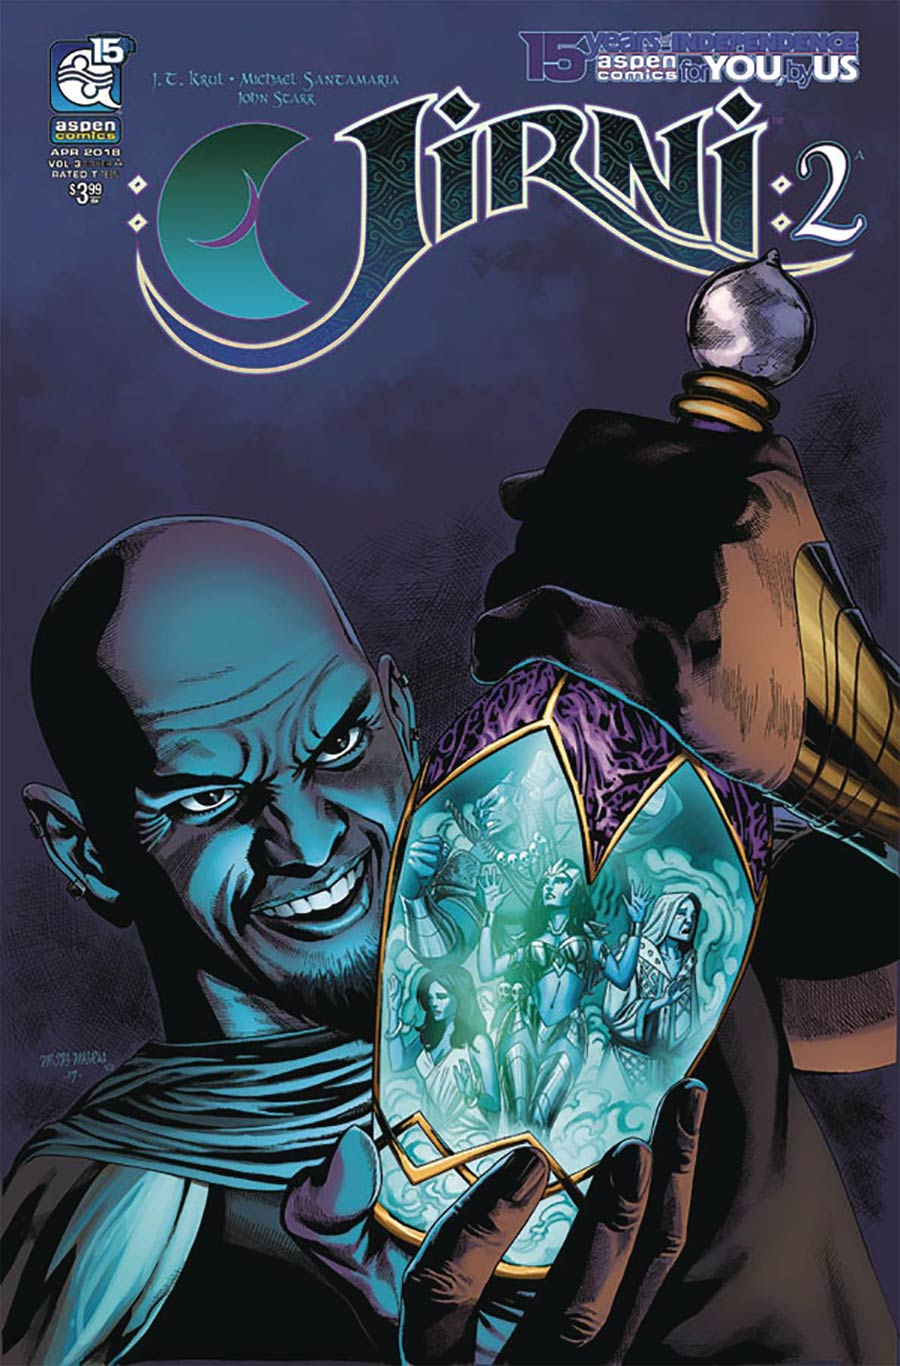 Jirni Vol 3 #2 Cover A Regular Michael Santamaria Cover